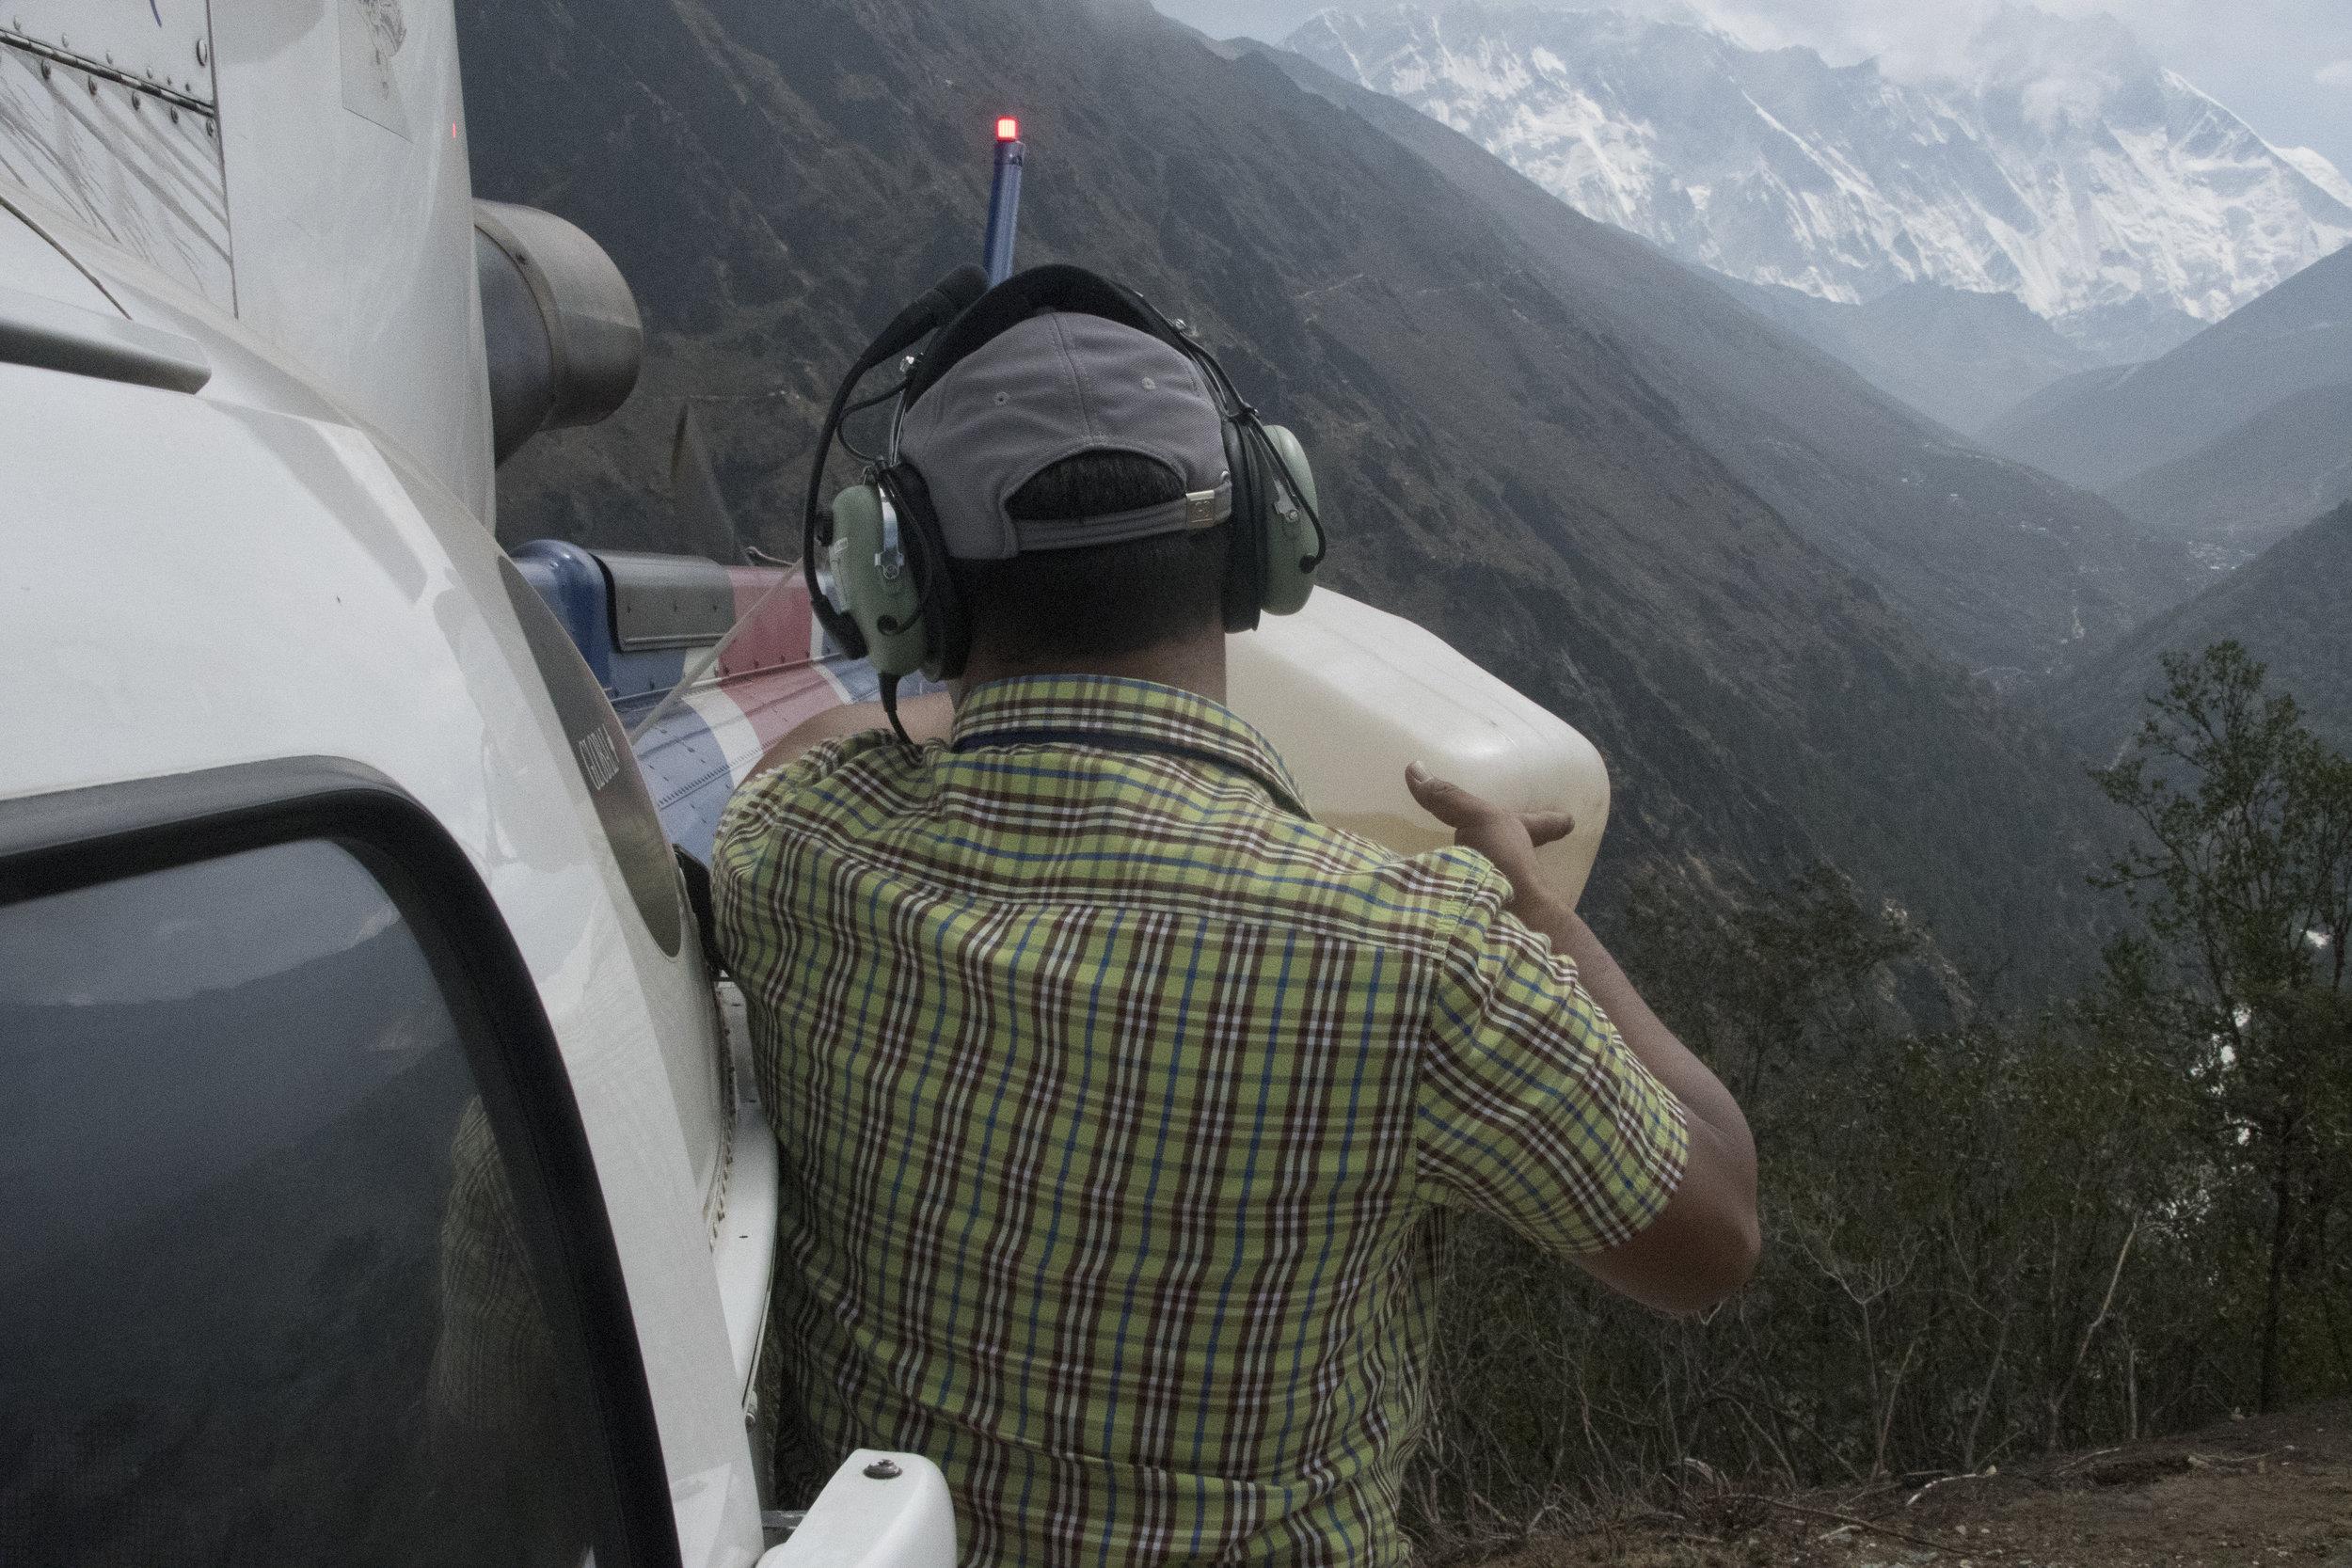 mck nepal 2017 refueling at temboche DSC_3135.jpg